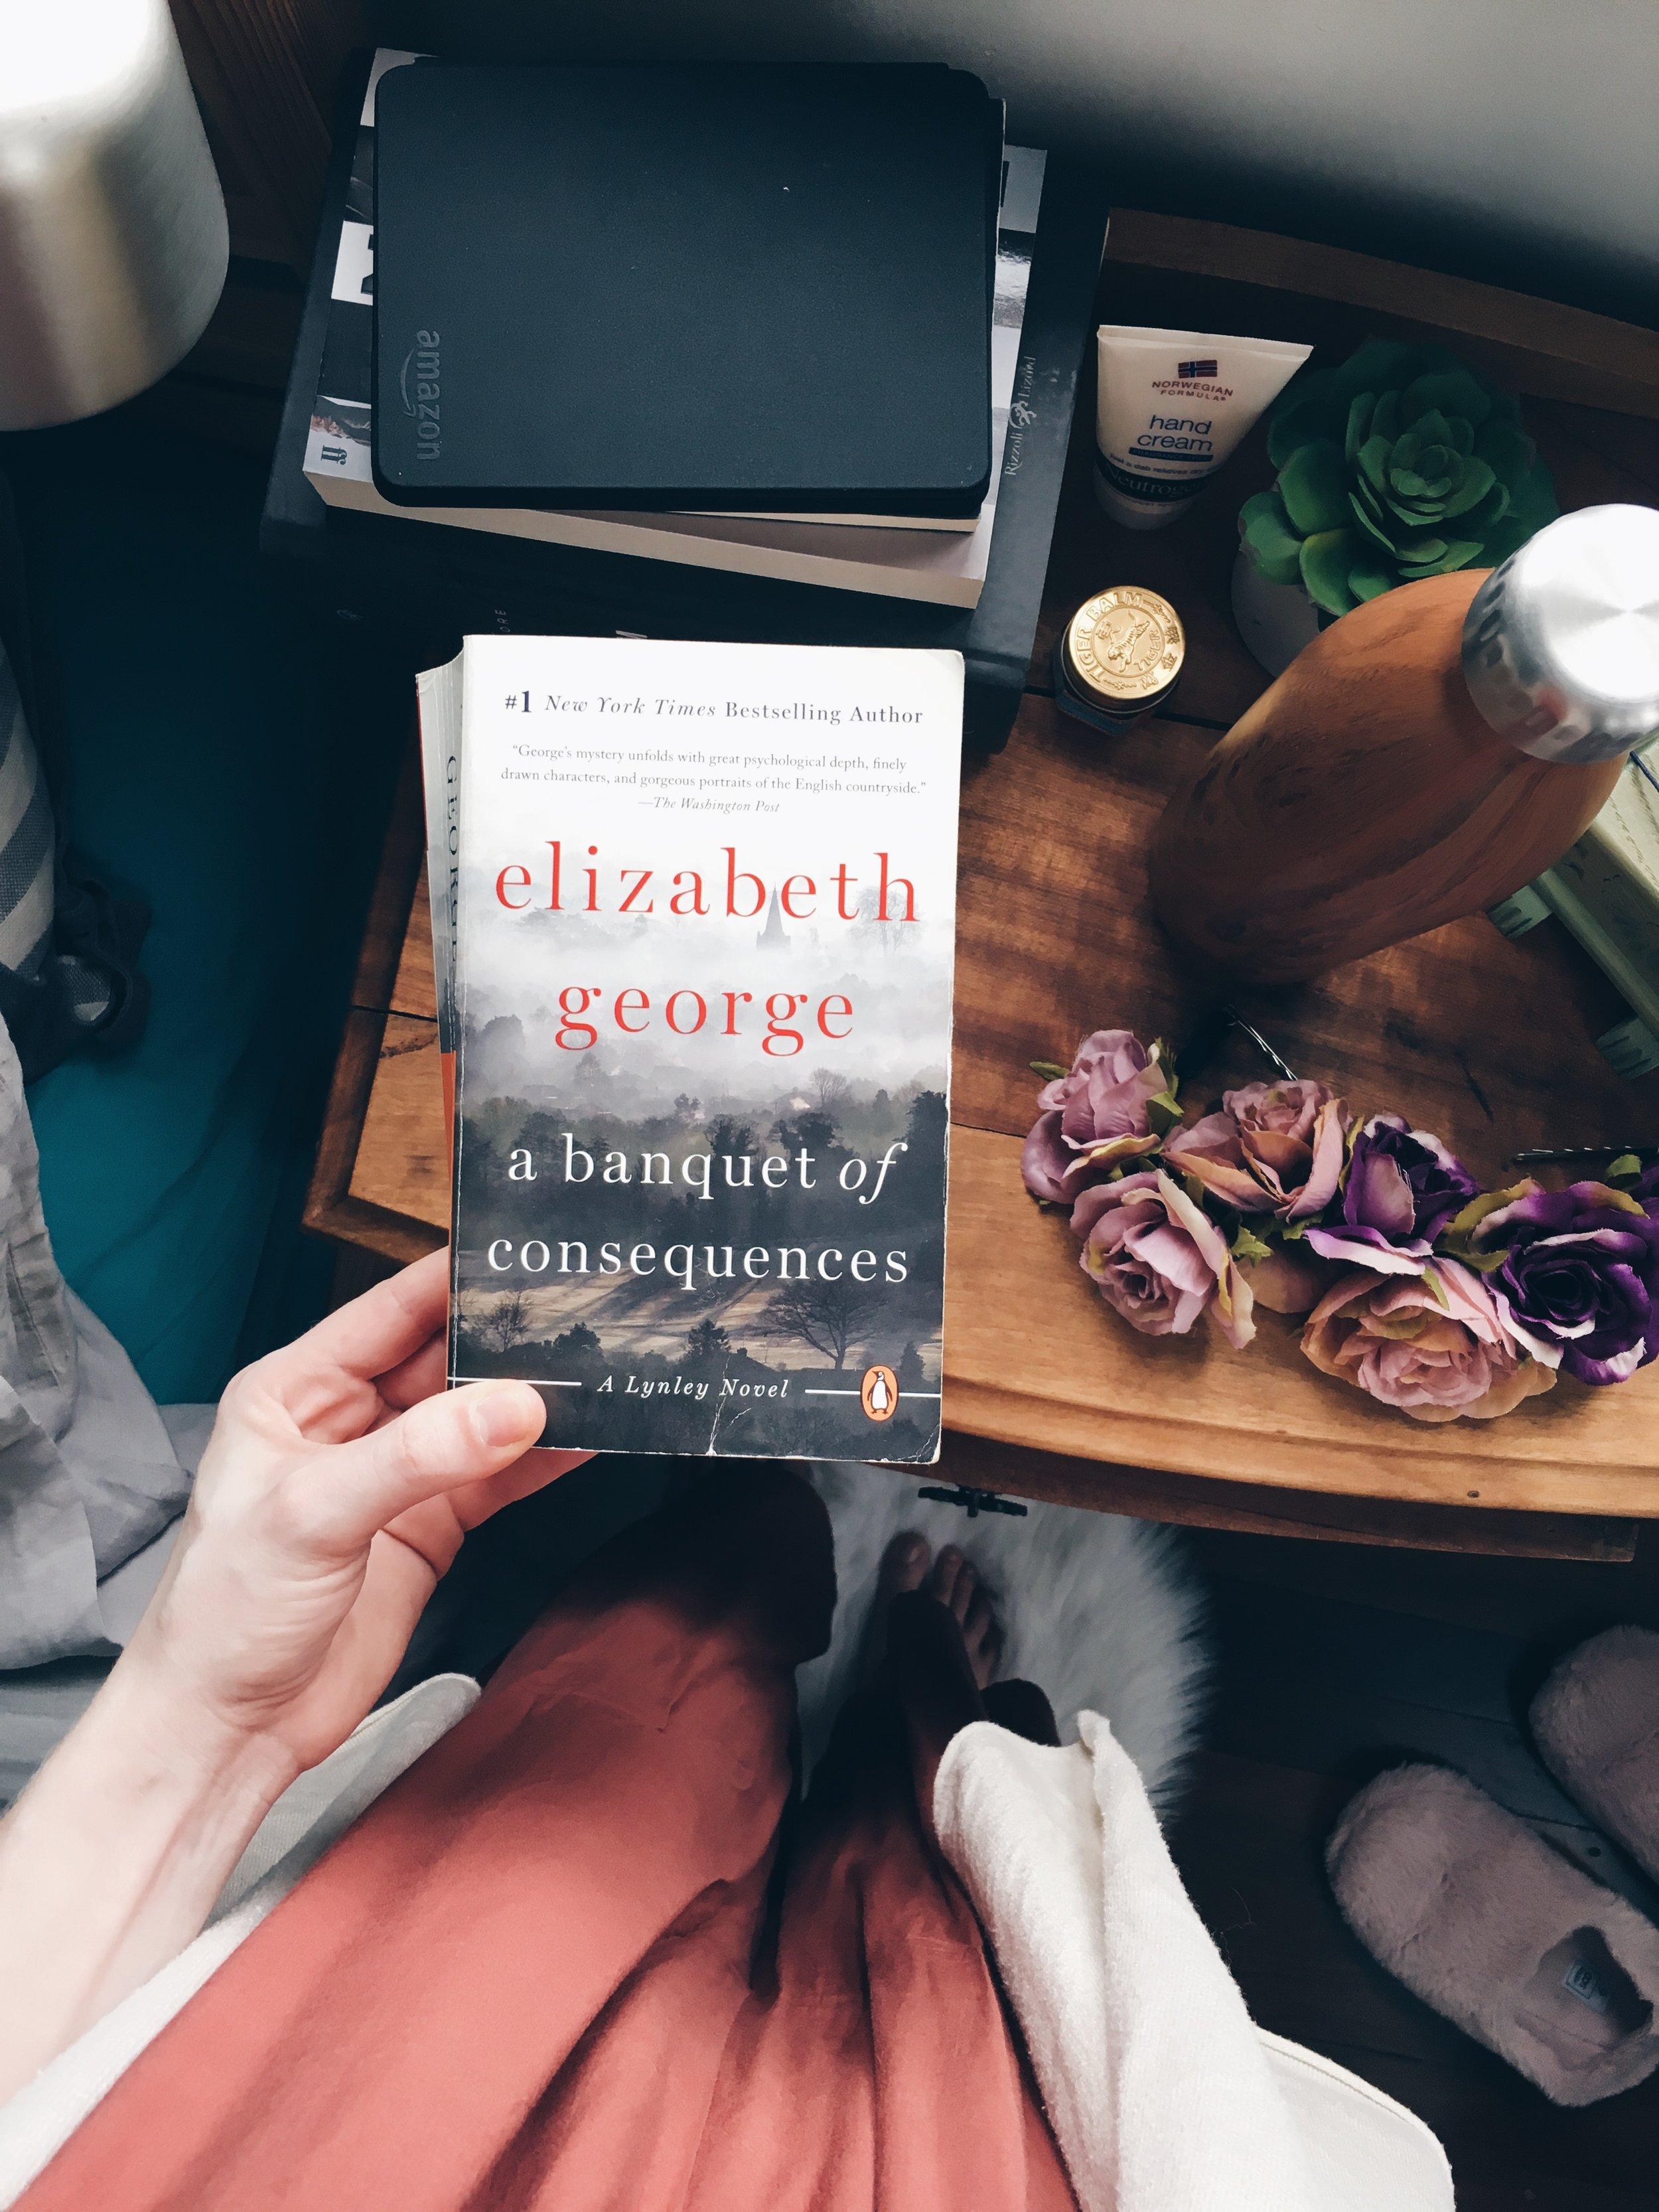 ElizabethGeorge.JPG